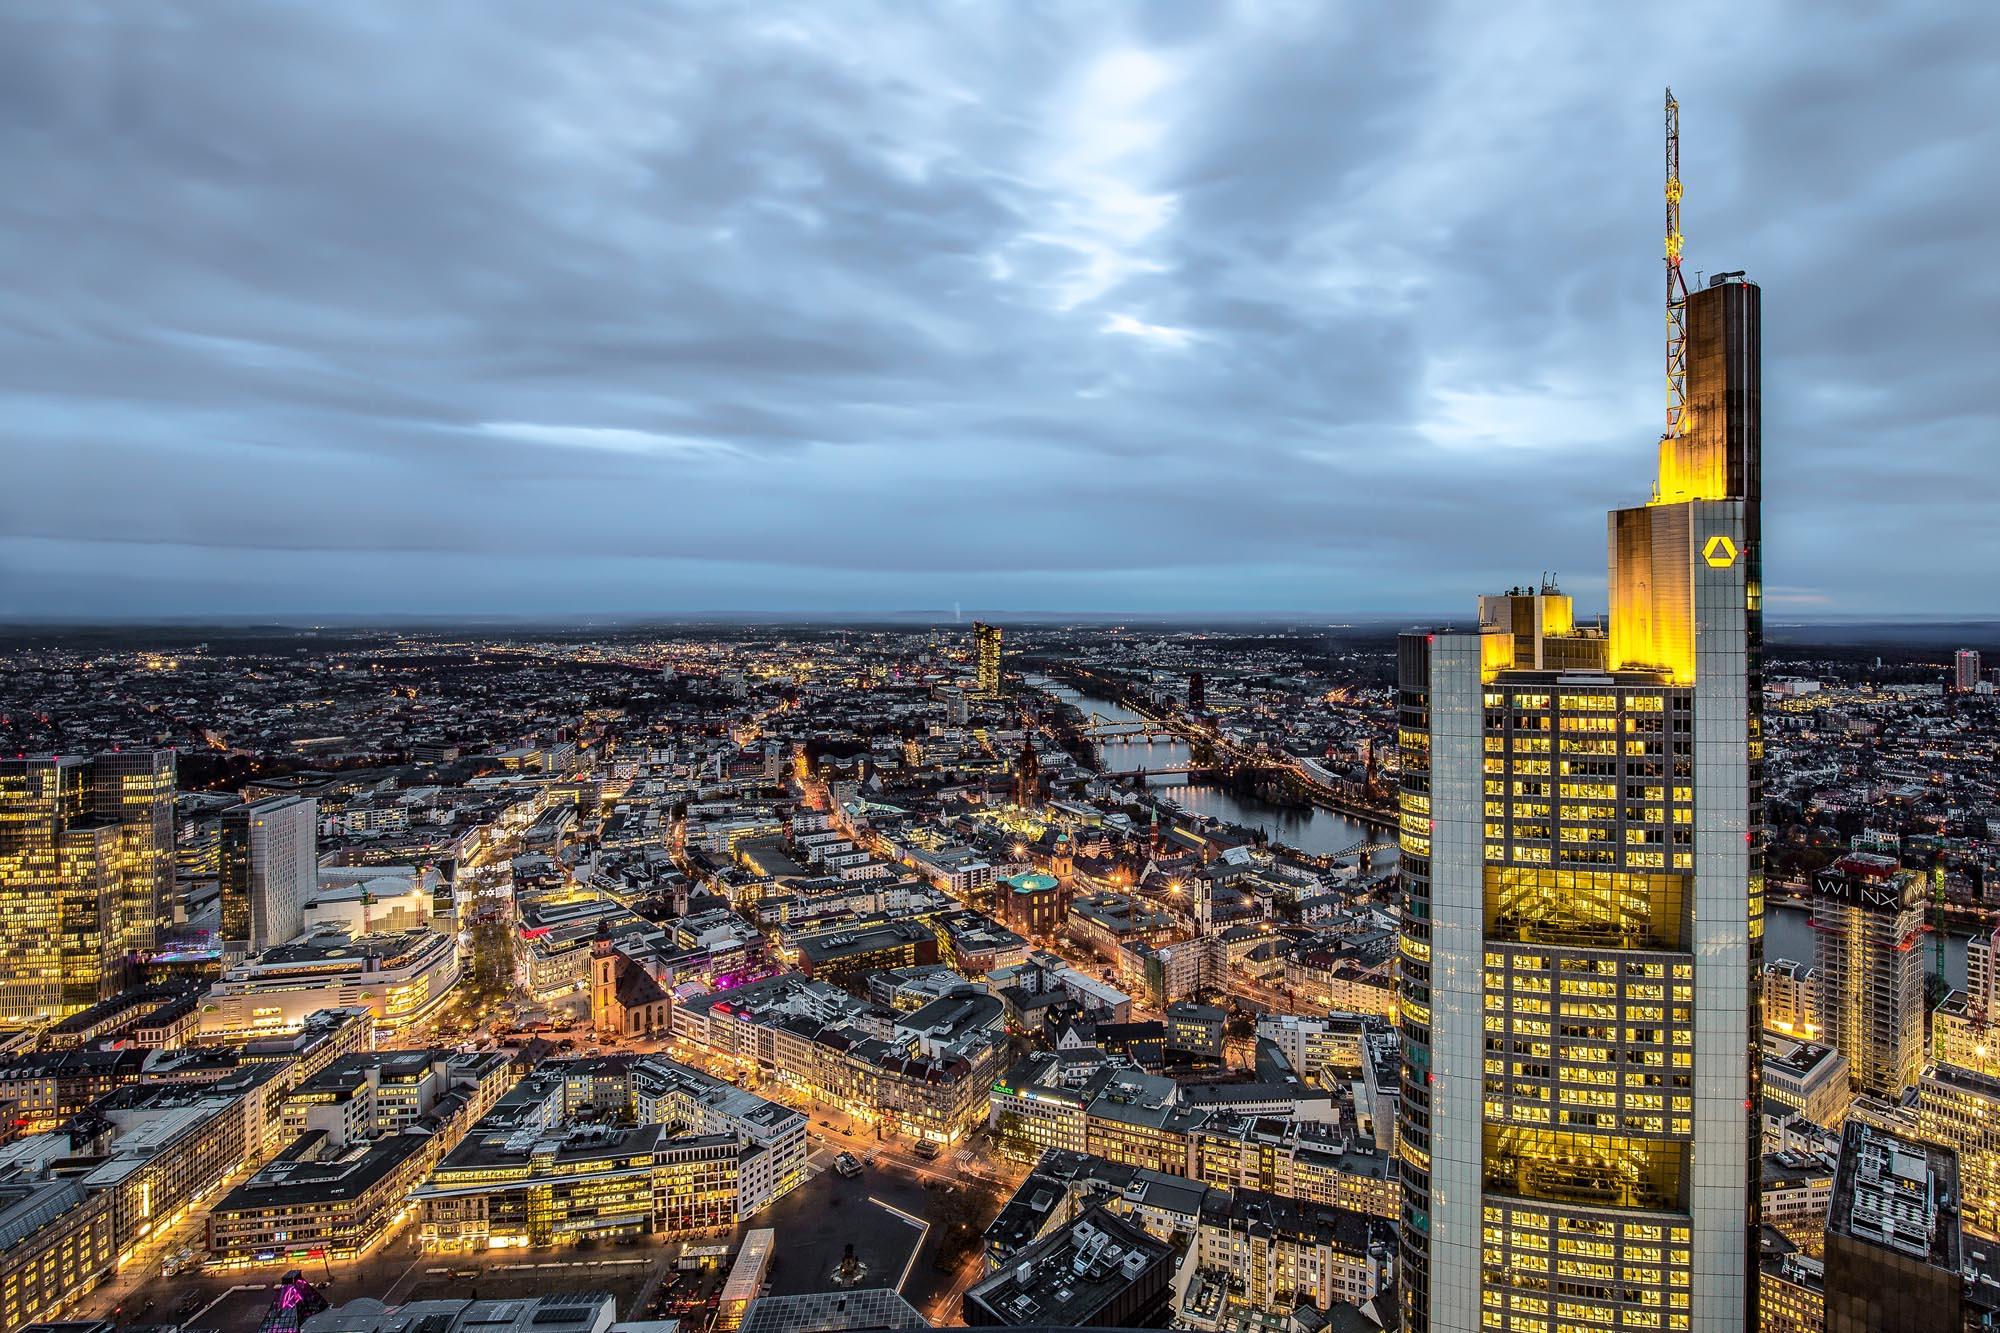 Mercure Hotel Messe Frankfurt